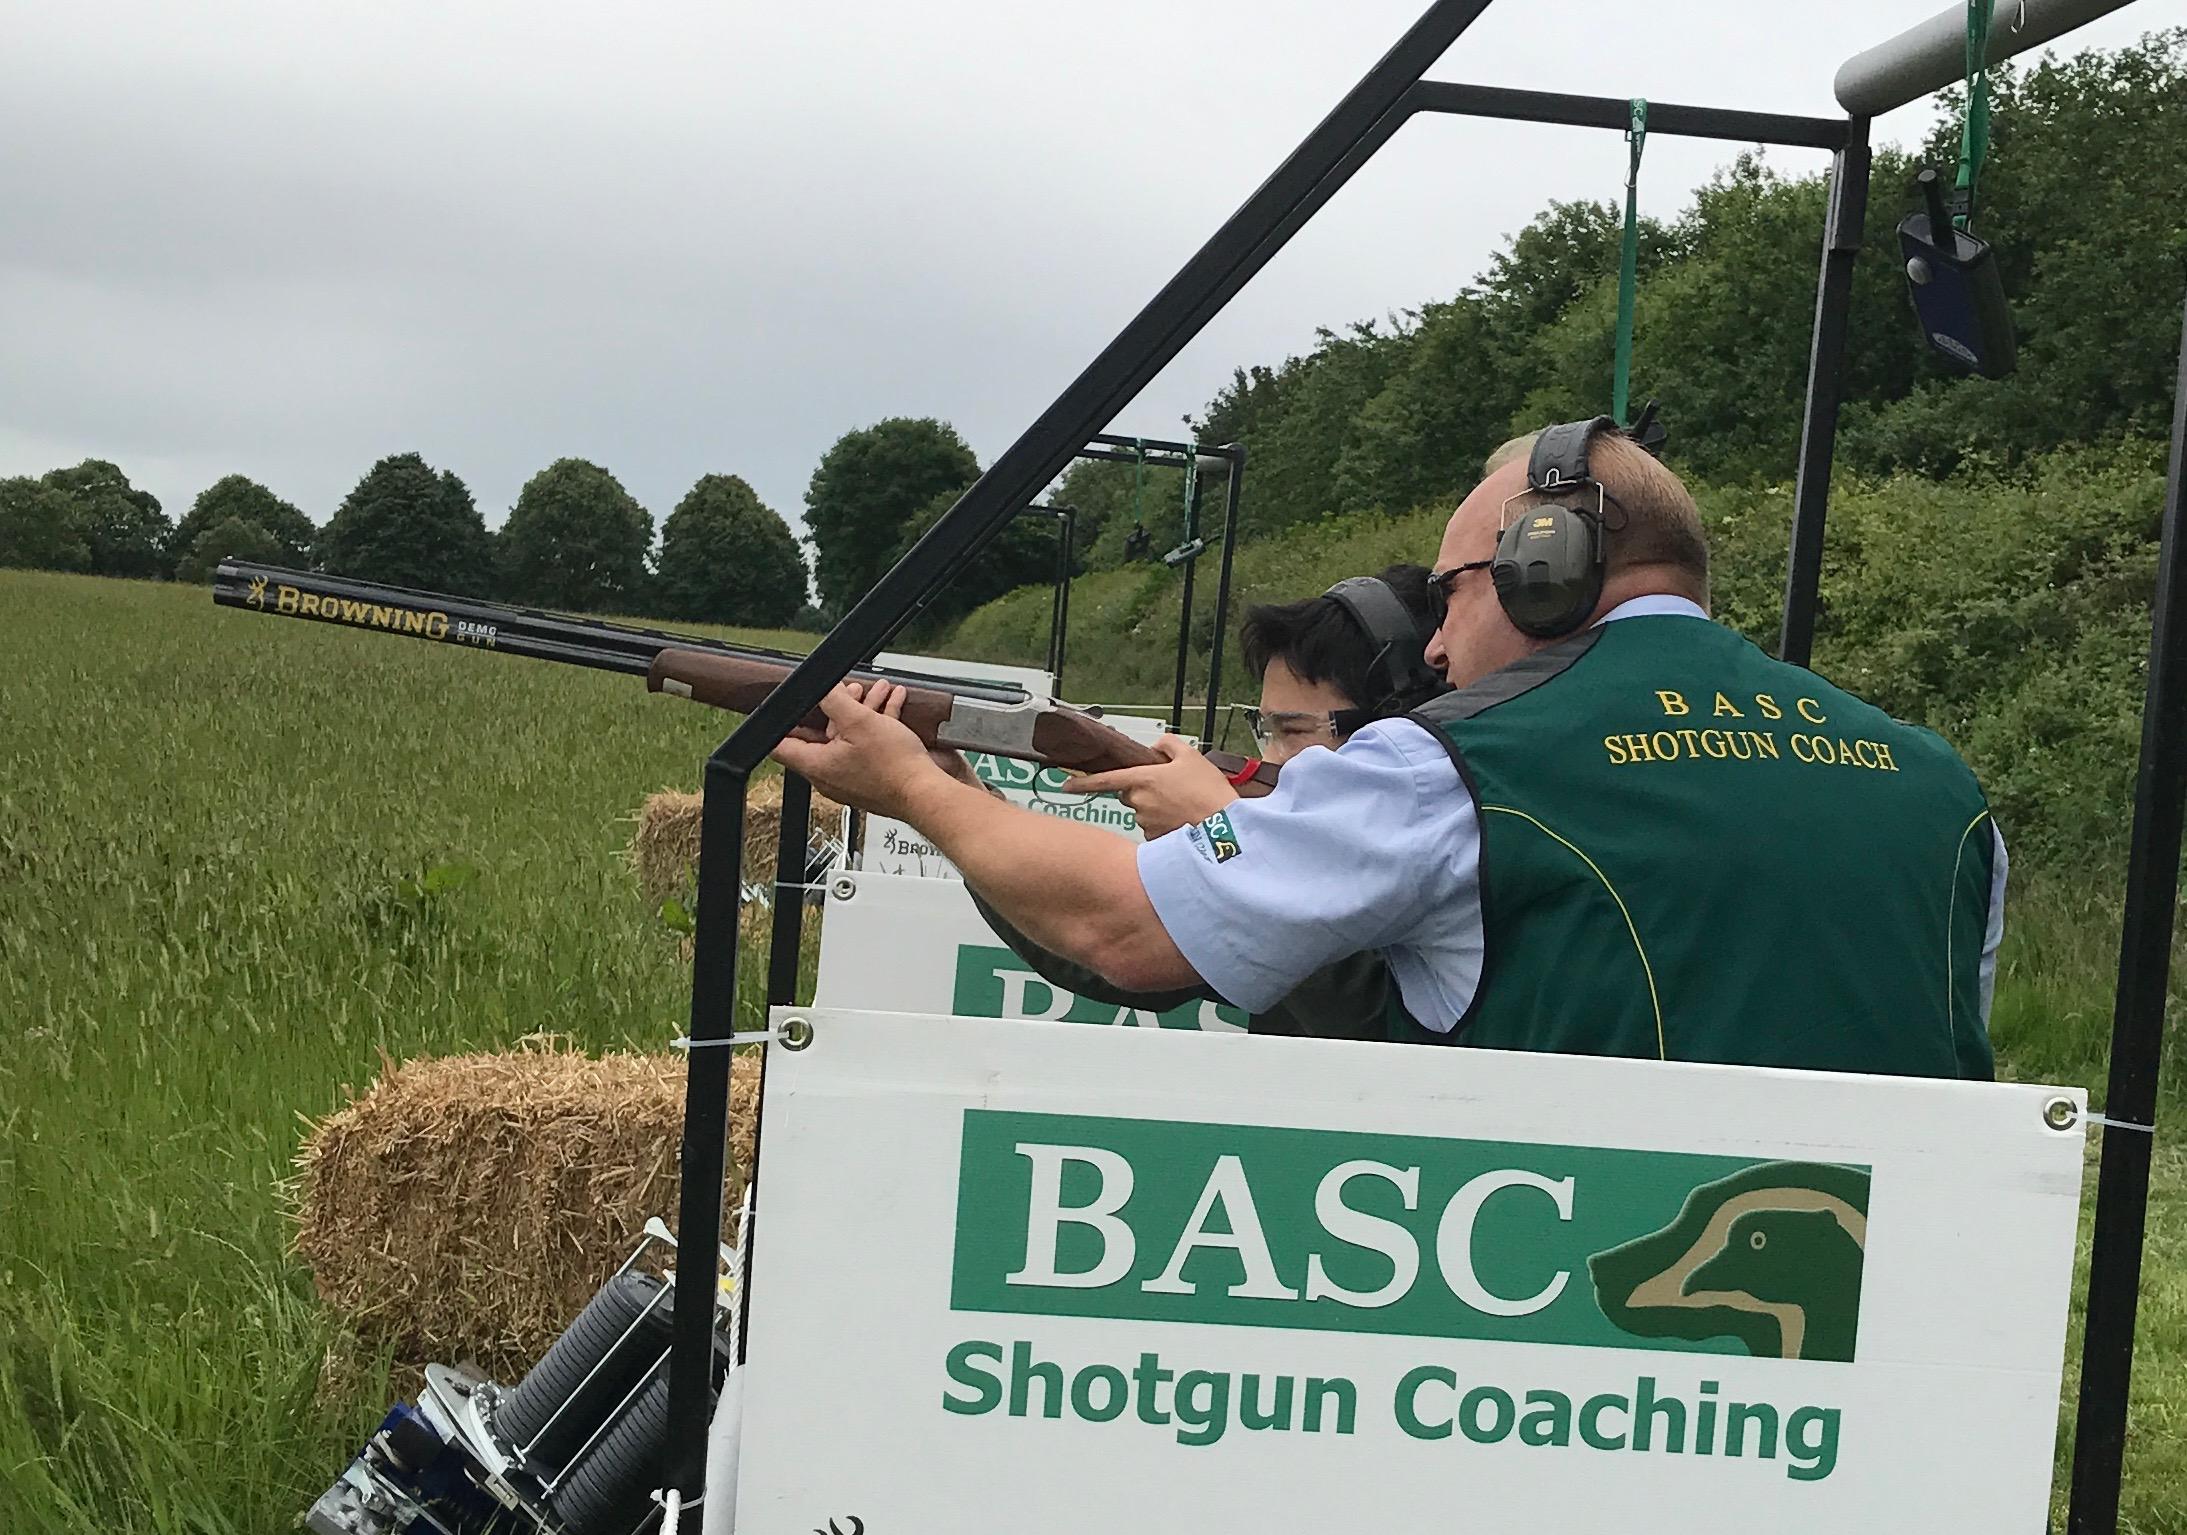 BASC Coach 8